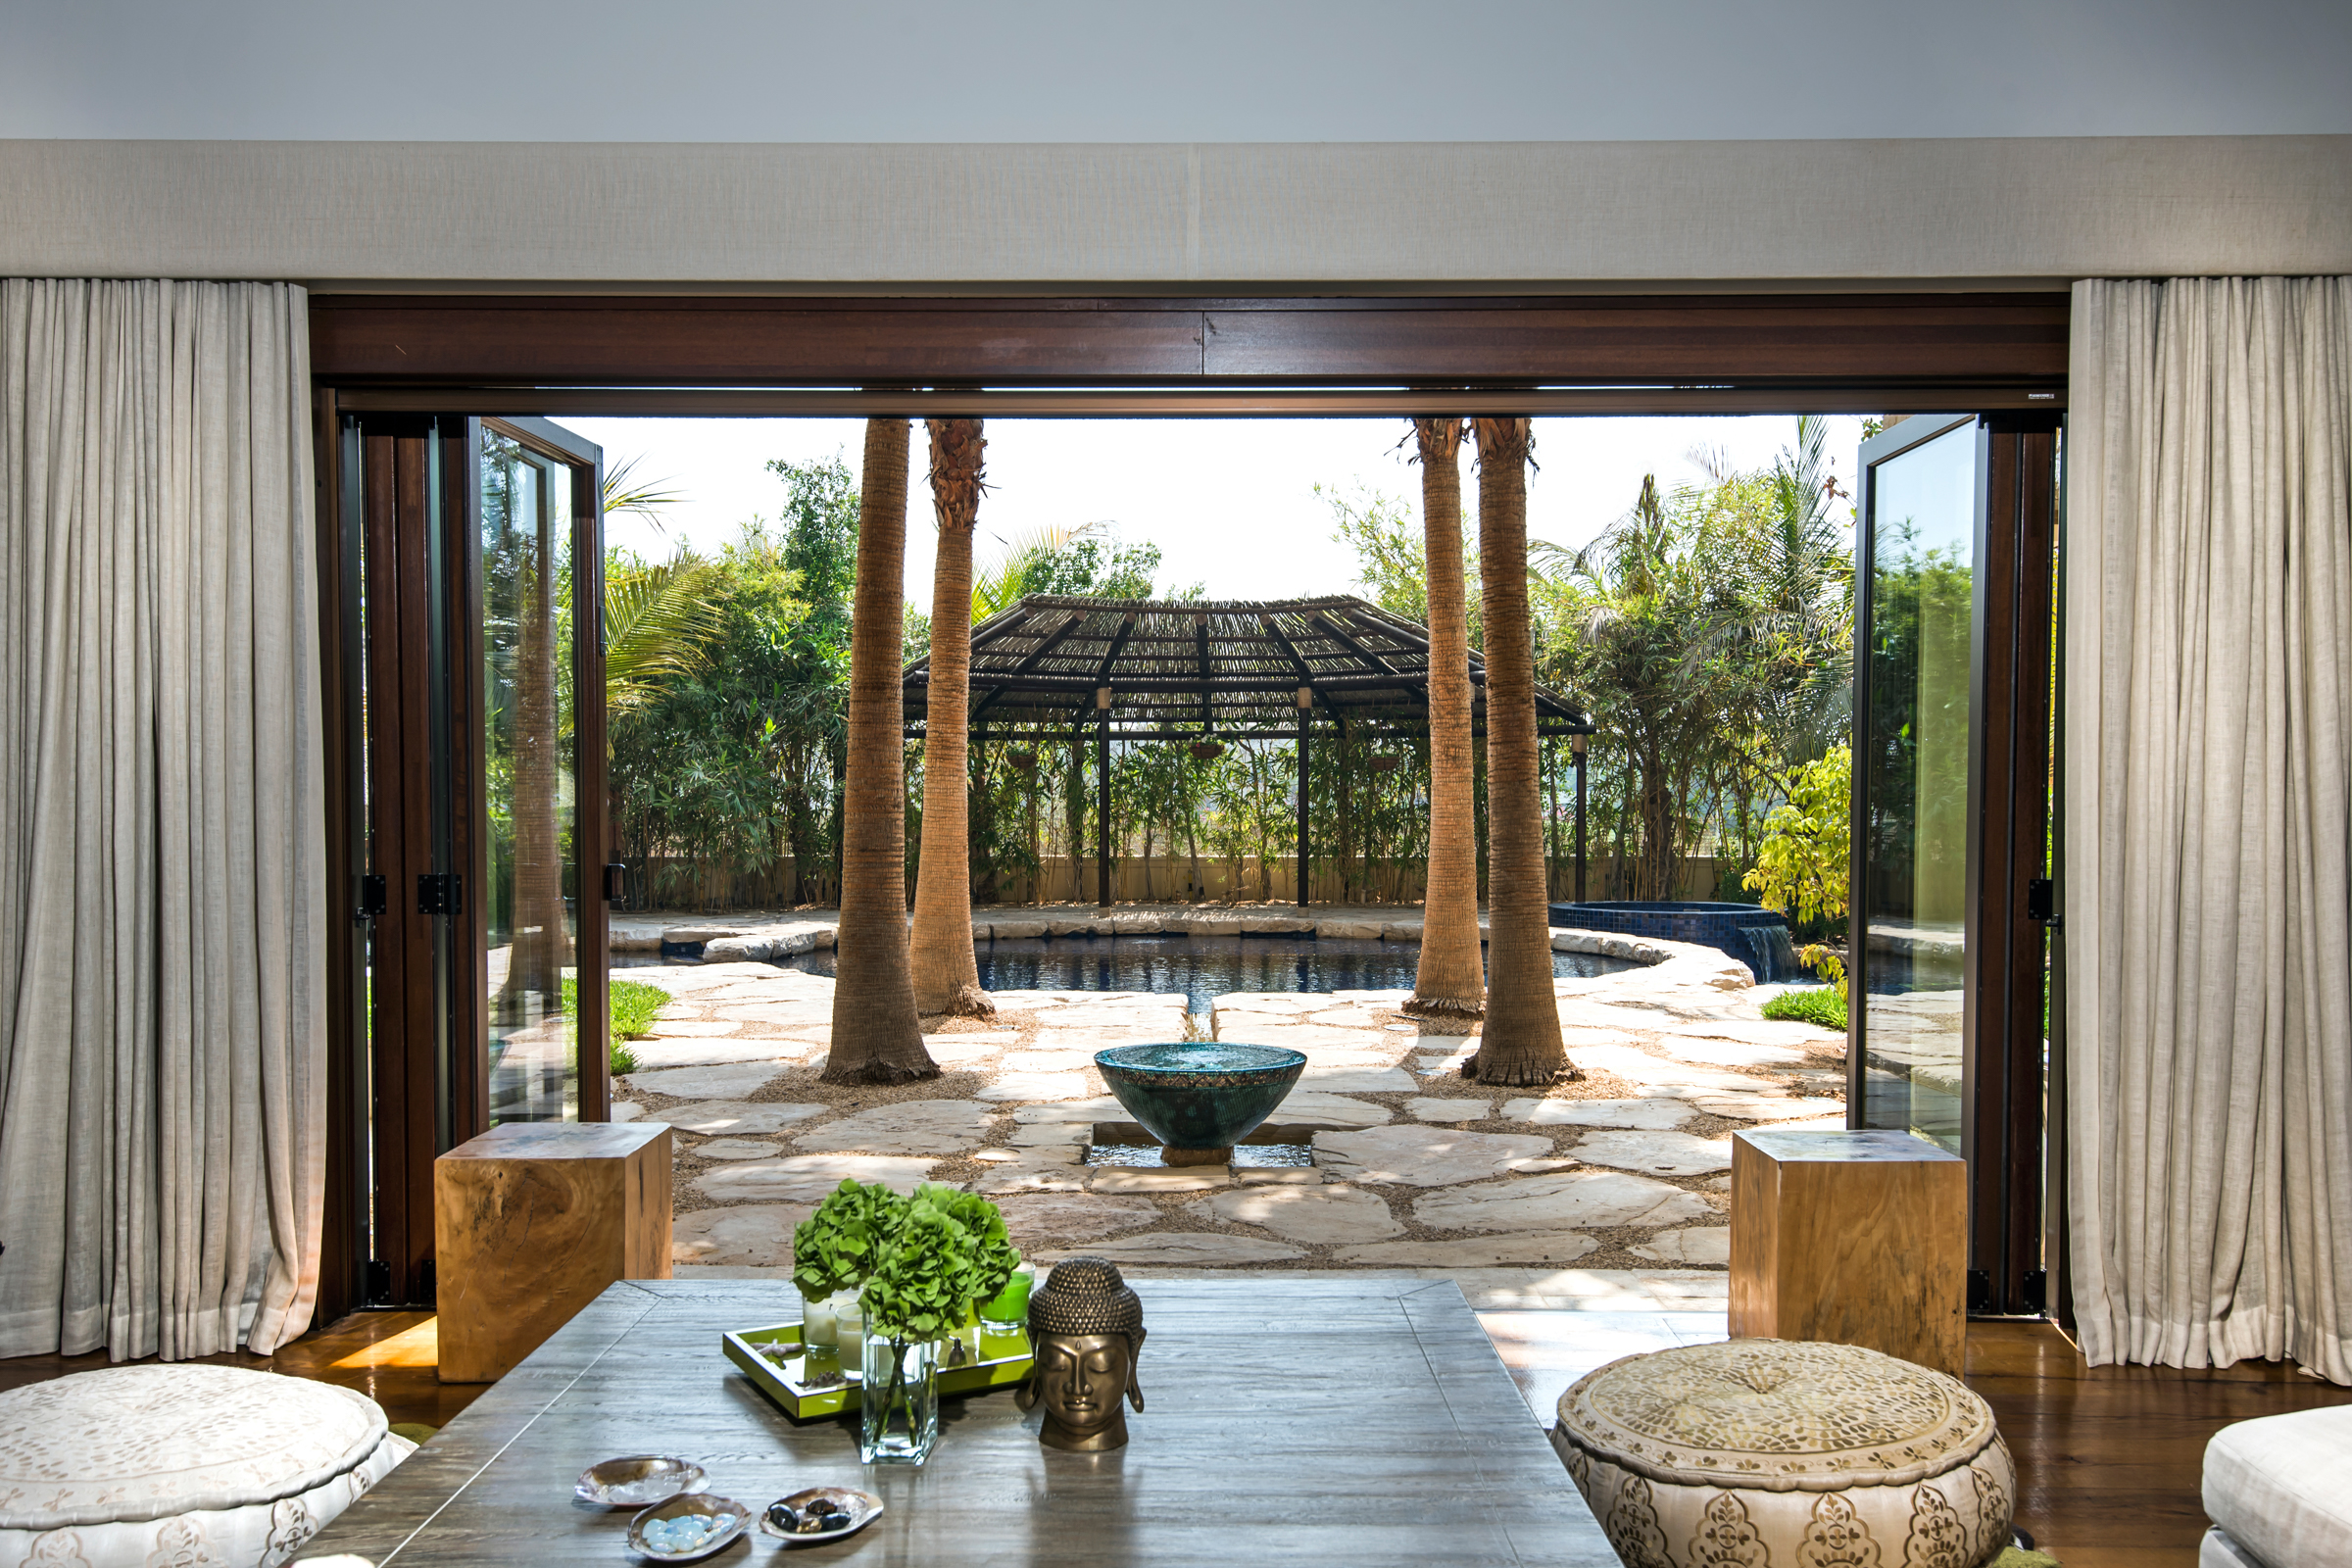 Single Family Home for Sale at Exclusive Elegant and Extraordinary Villa Emirates Hills, Dubai, United Arab Emirates